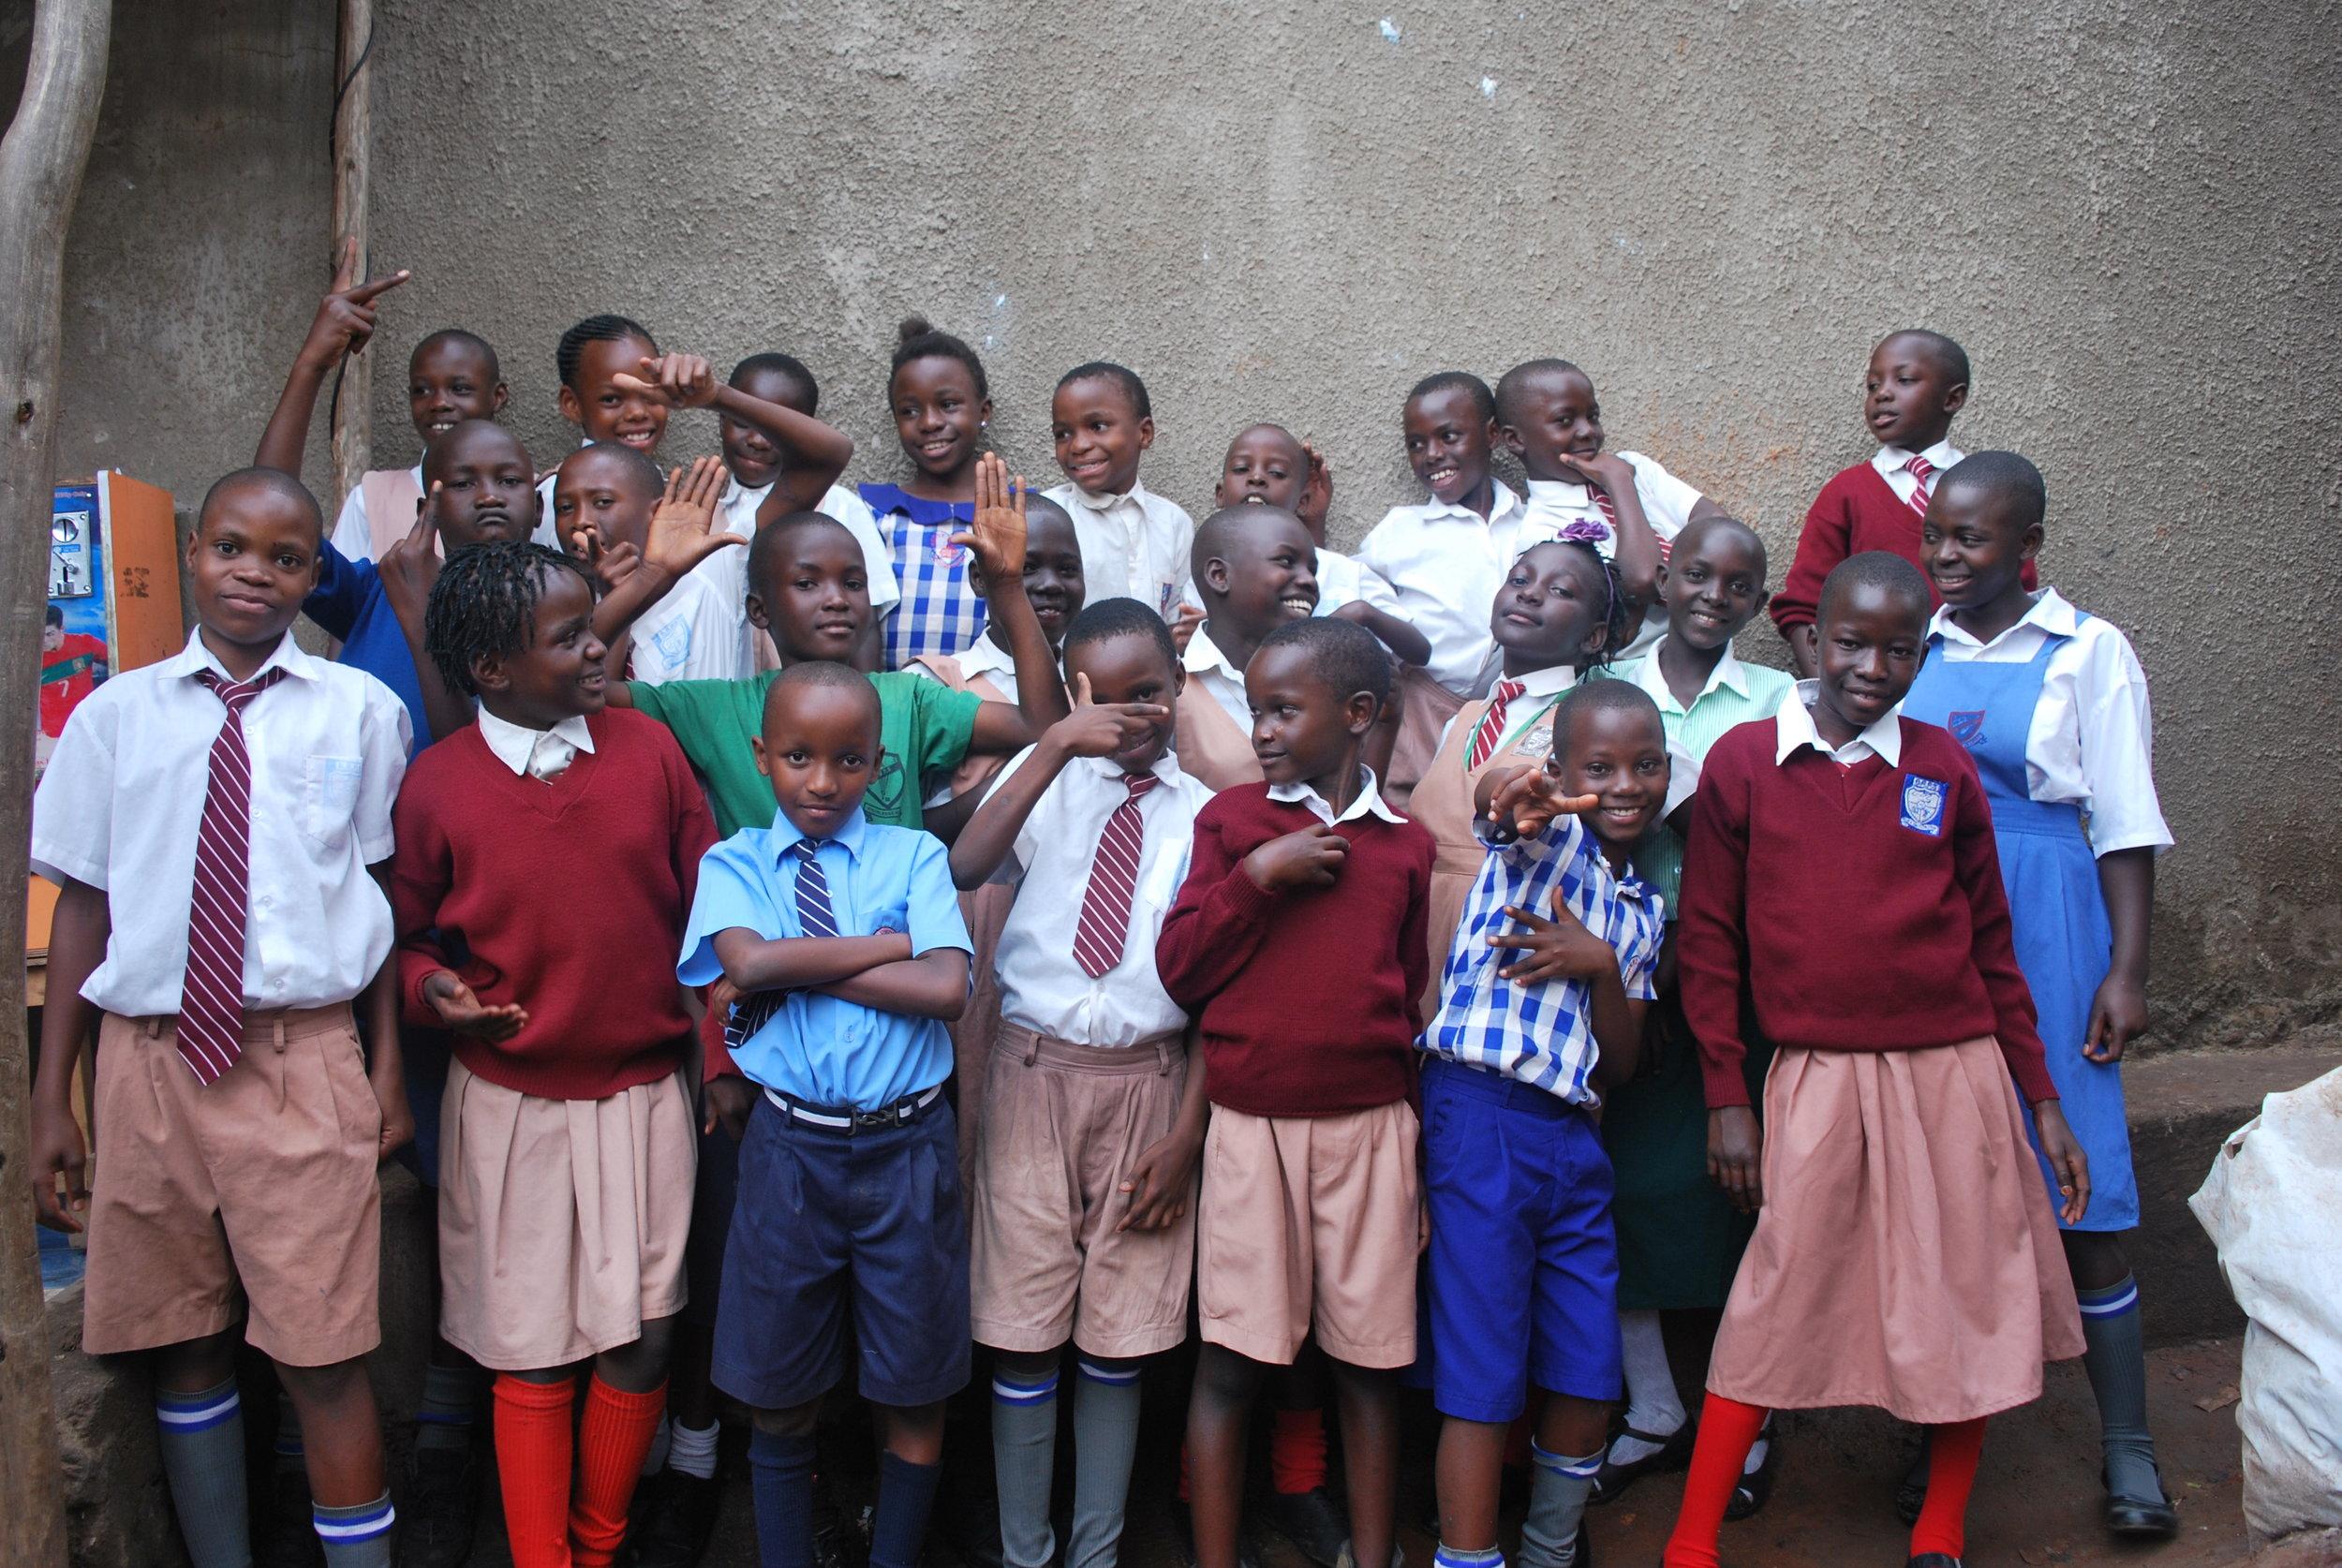 24 of 42 sponsored children going back to school on 30th Jan 2017.